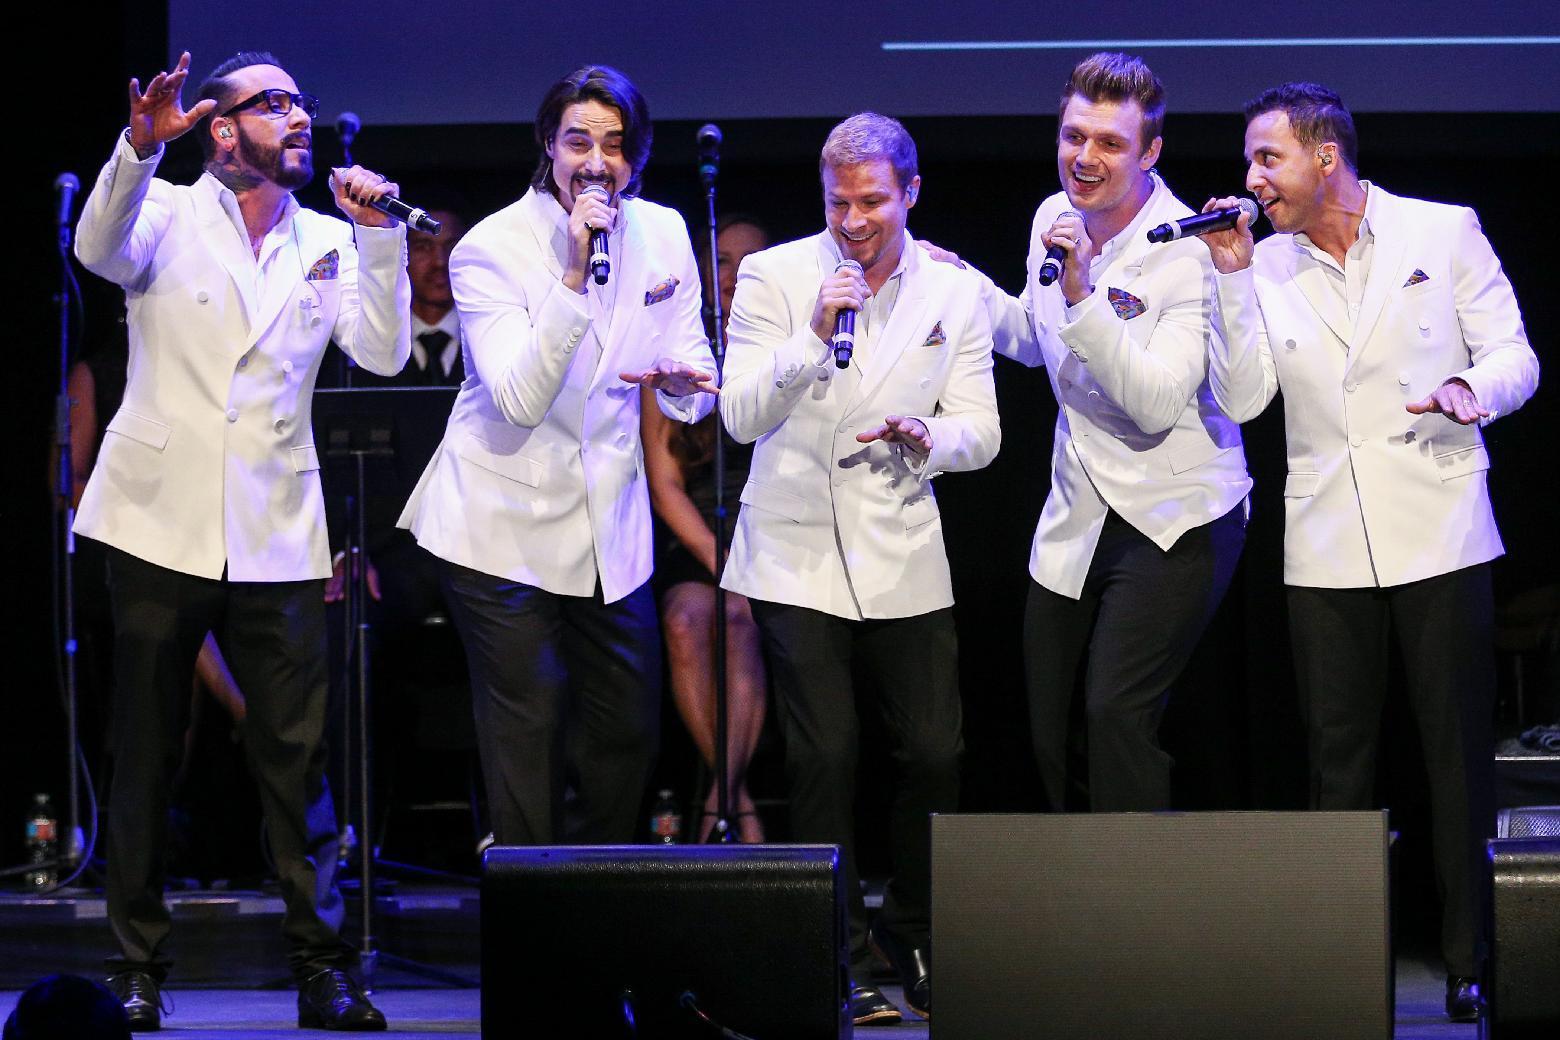 Backstreet Boys to perform Las Vegas residency